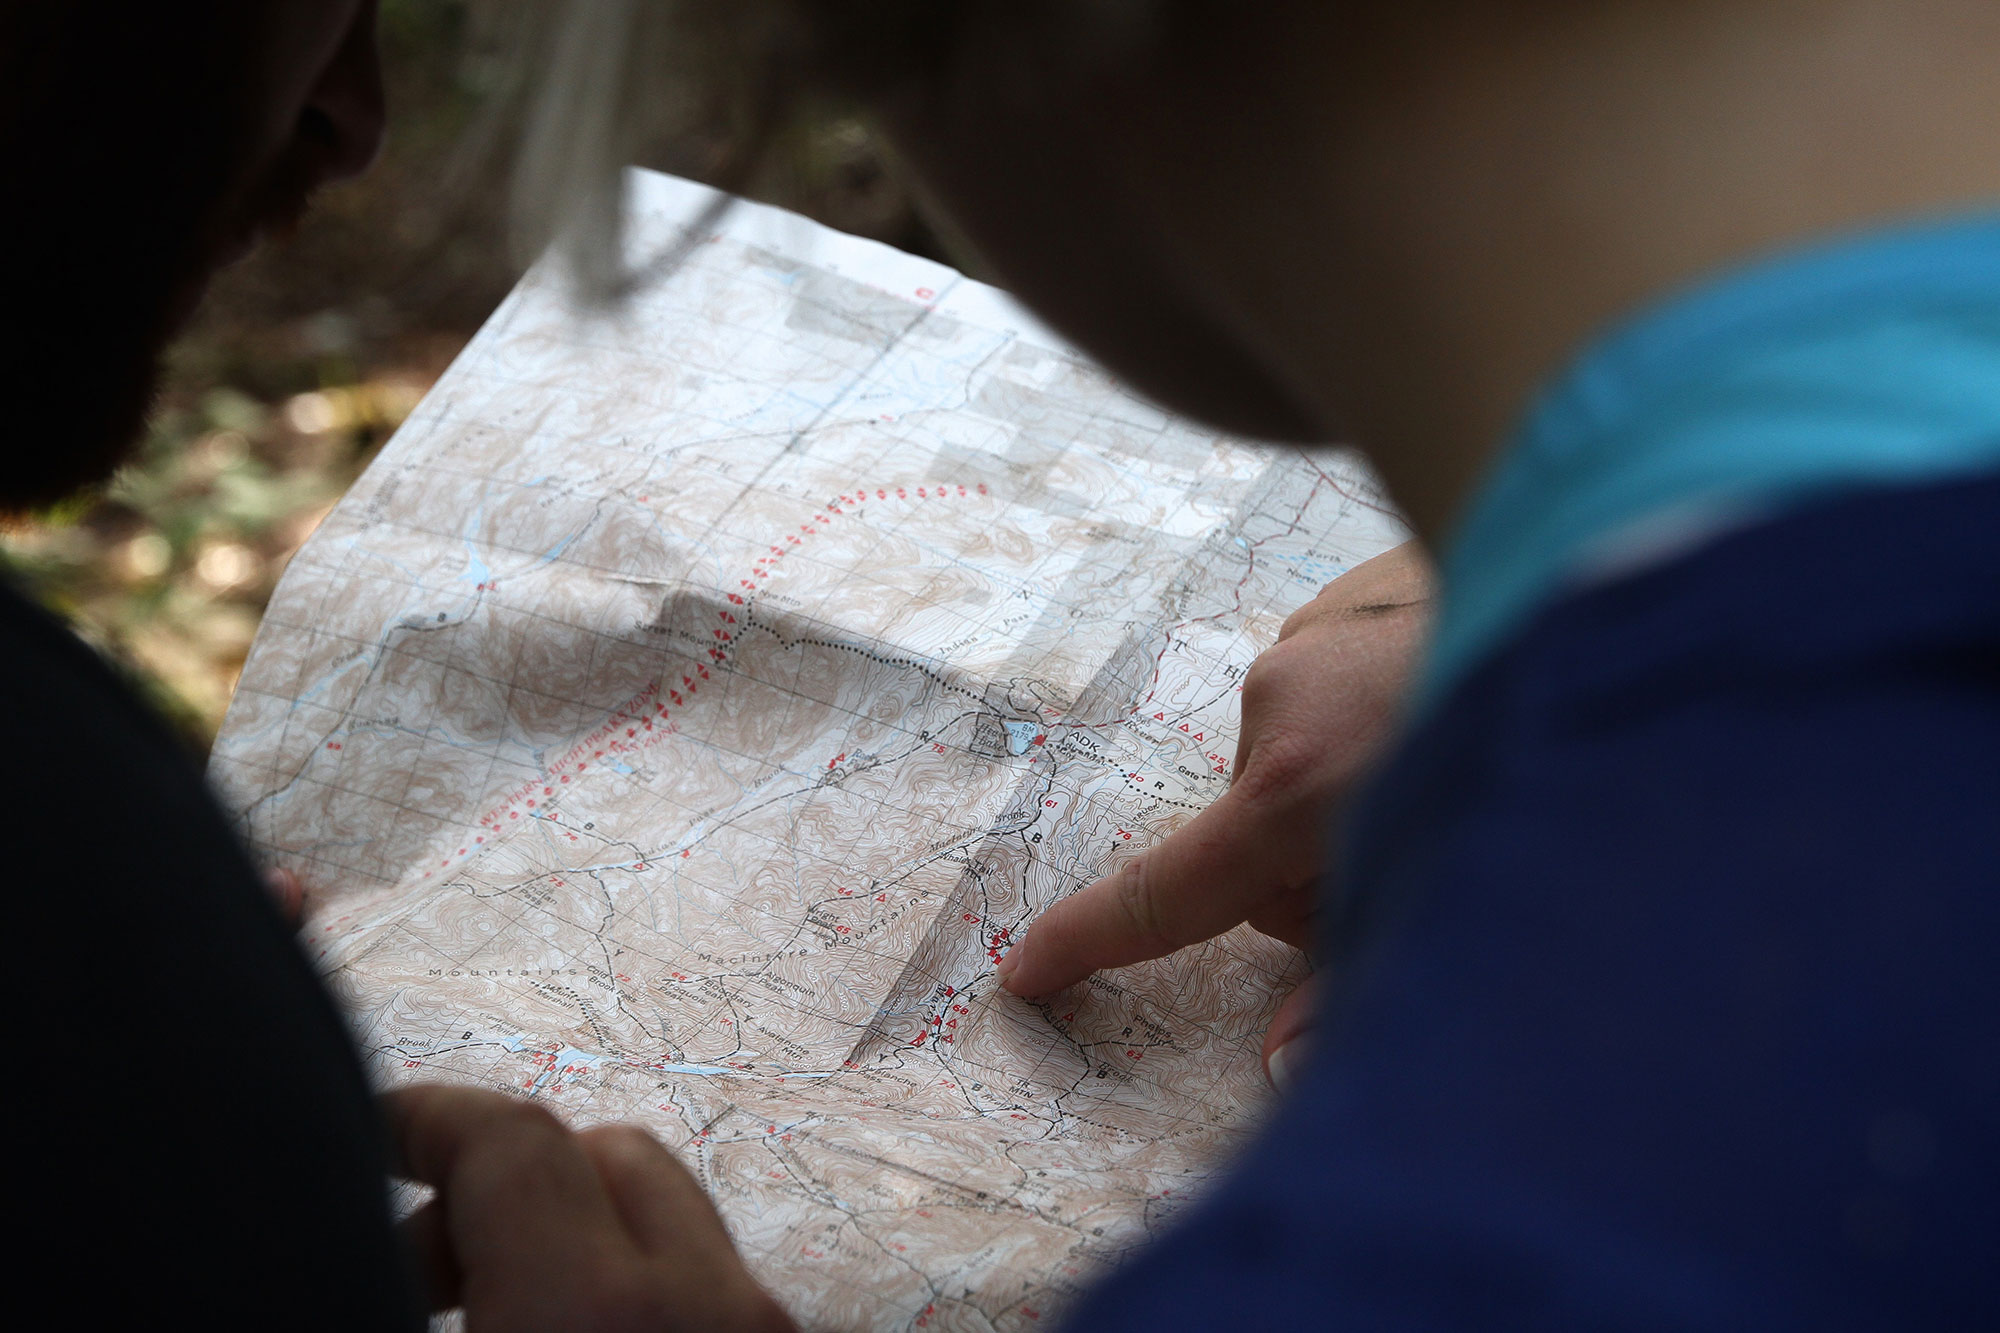 kaart lezen kompas